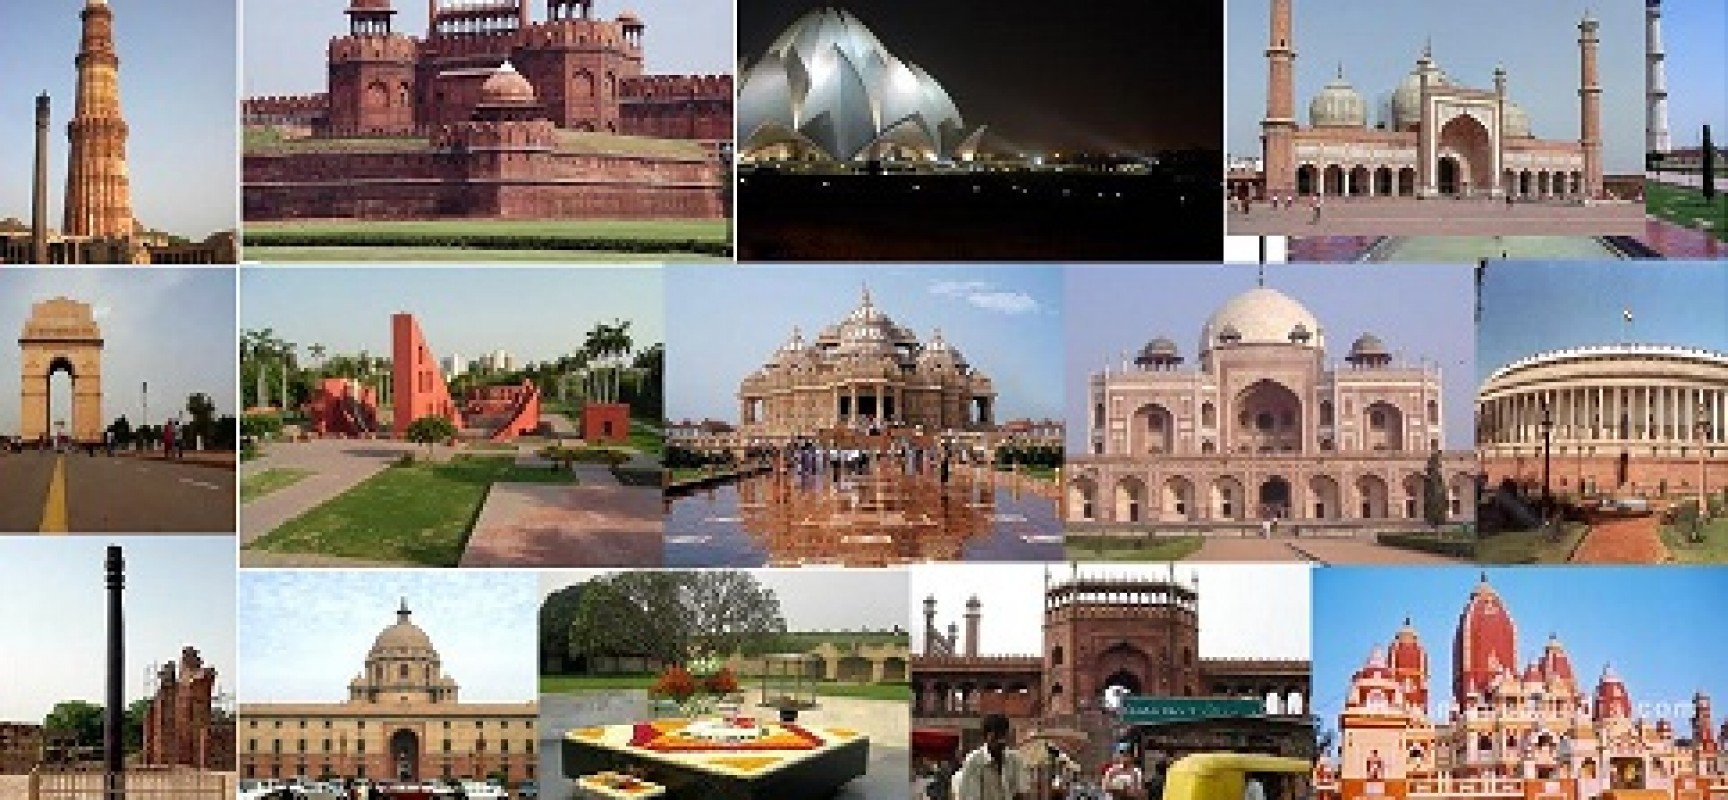 Forts in Delhi